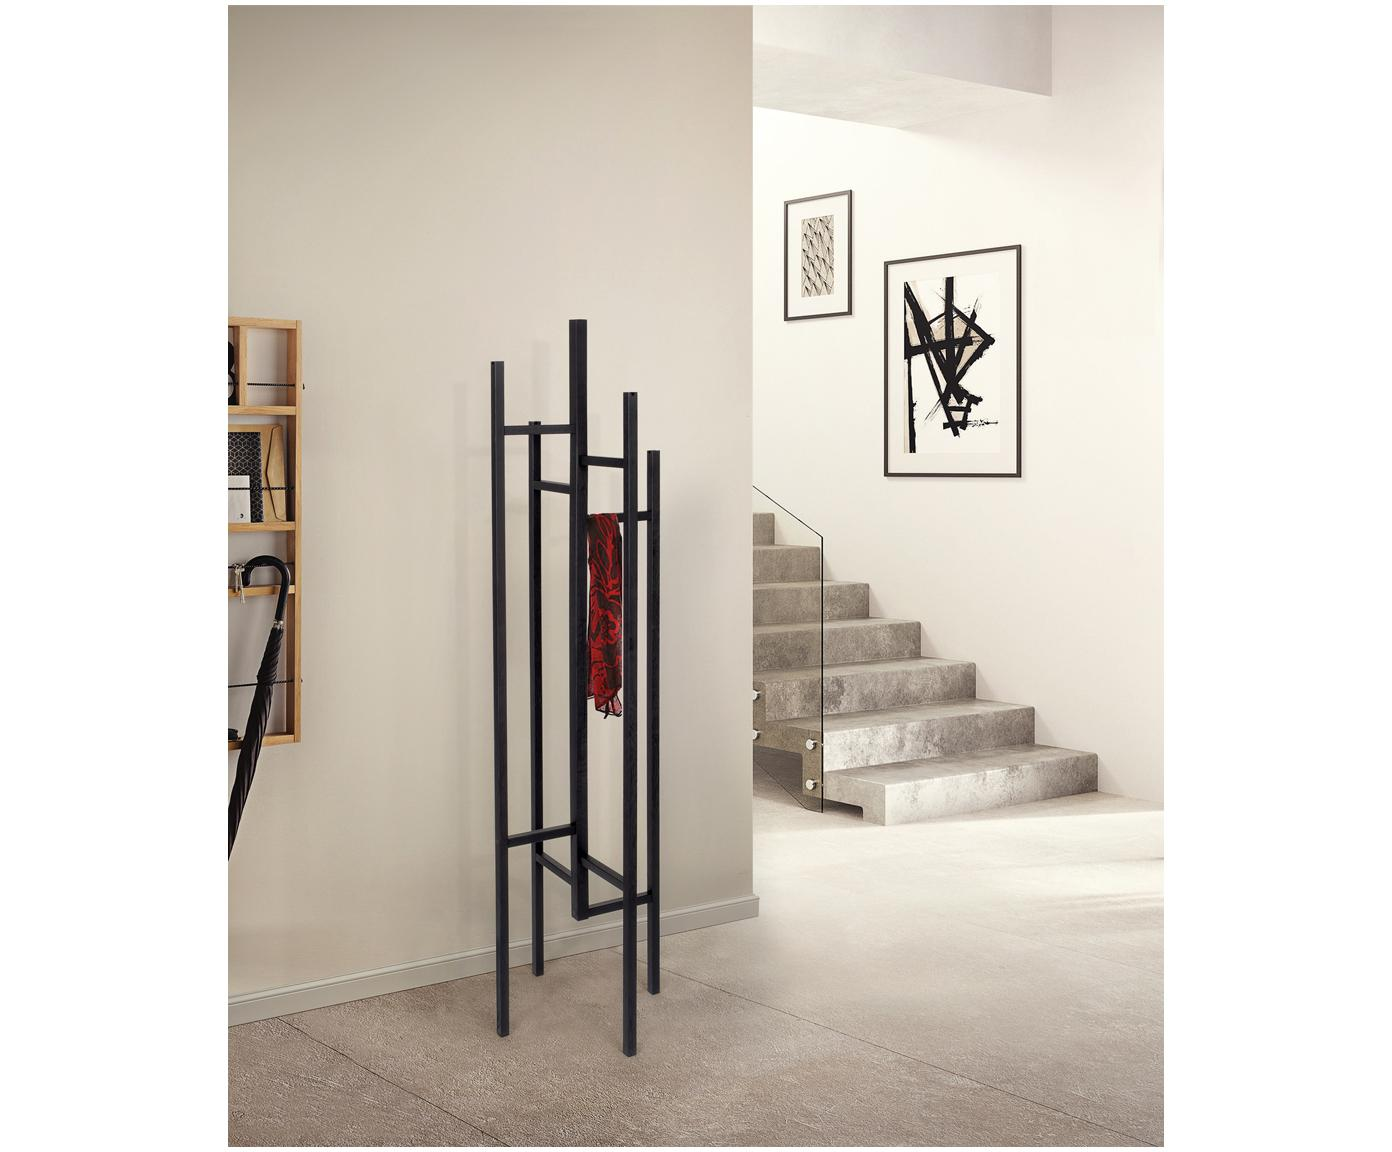 Moderne kapstok Eigen met 5 haken, Massief en gelakt eikenhout, Zwart, 47 x 175 cm